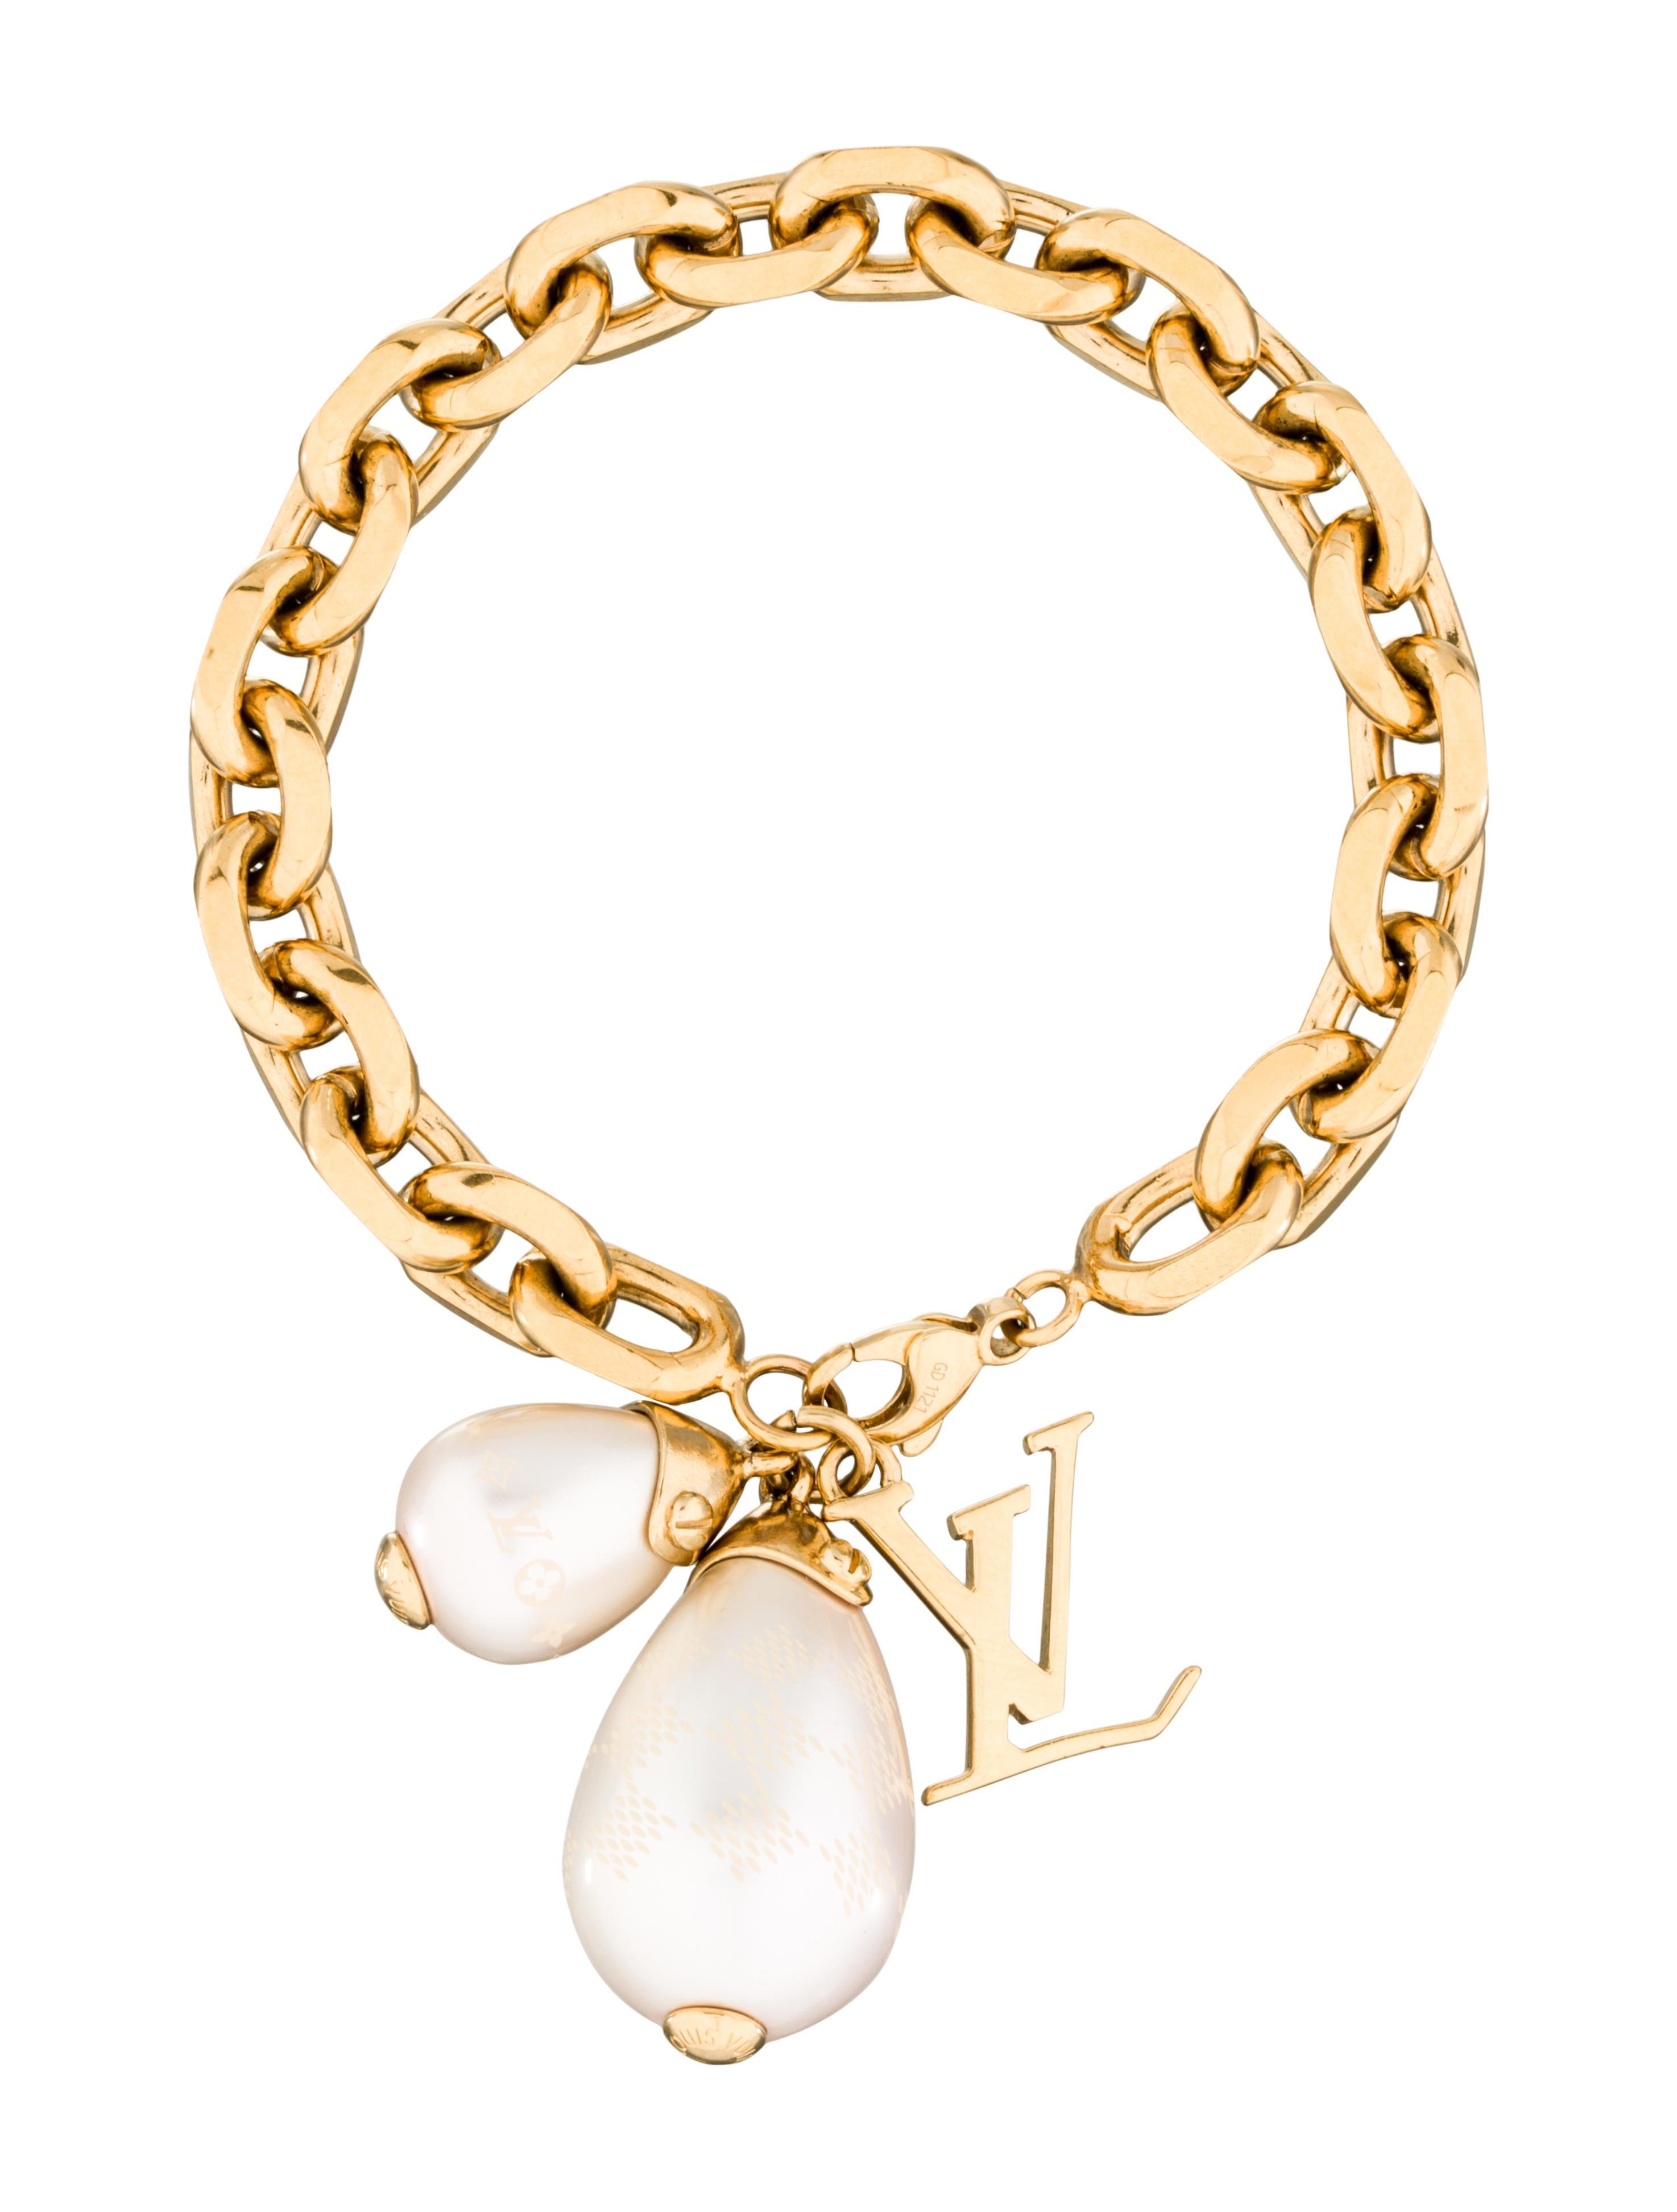 Damier Perle Bracelet